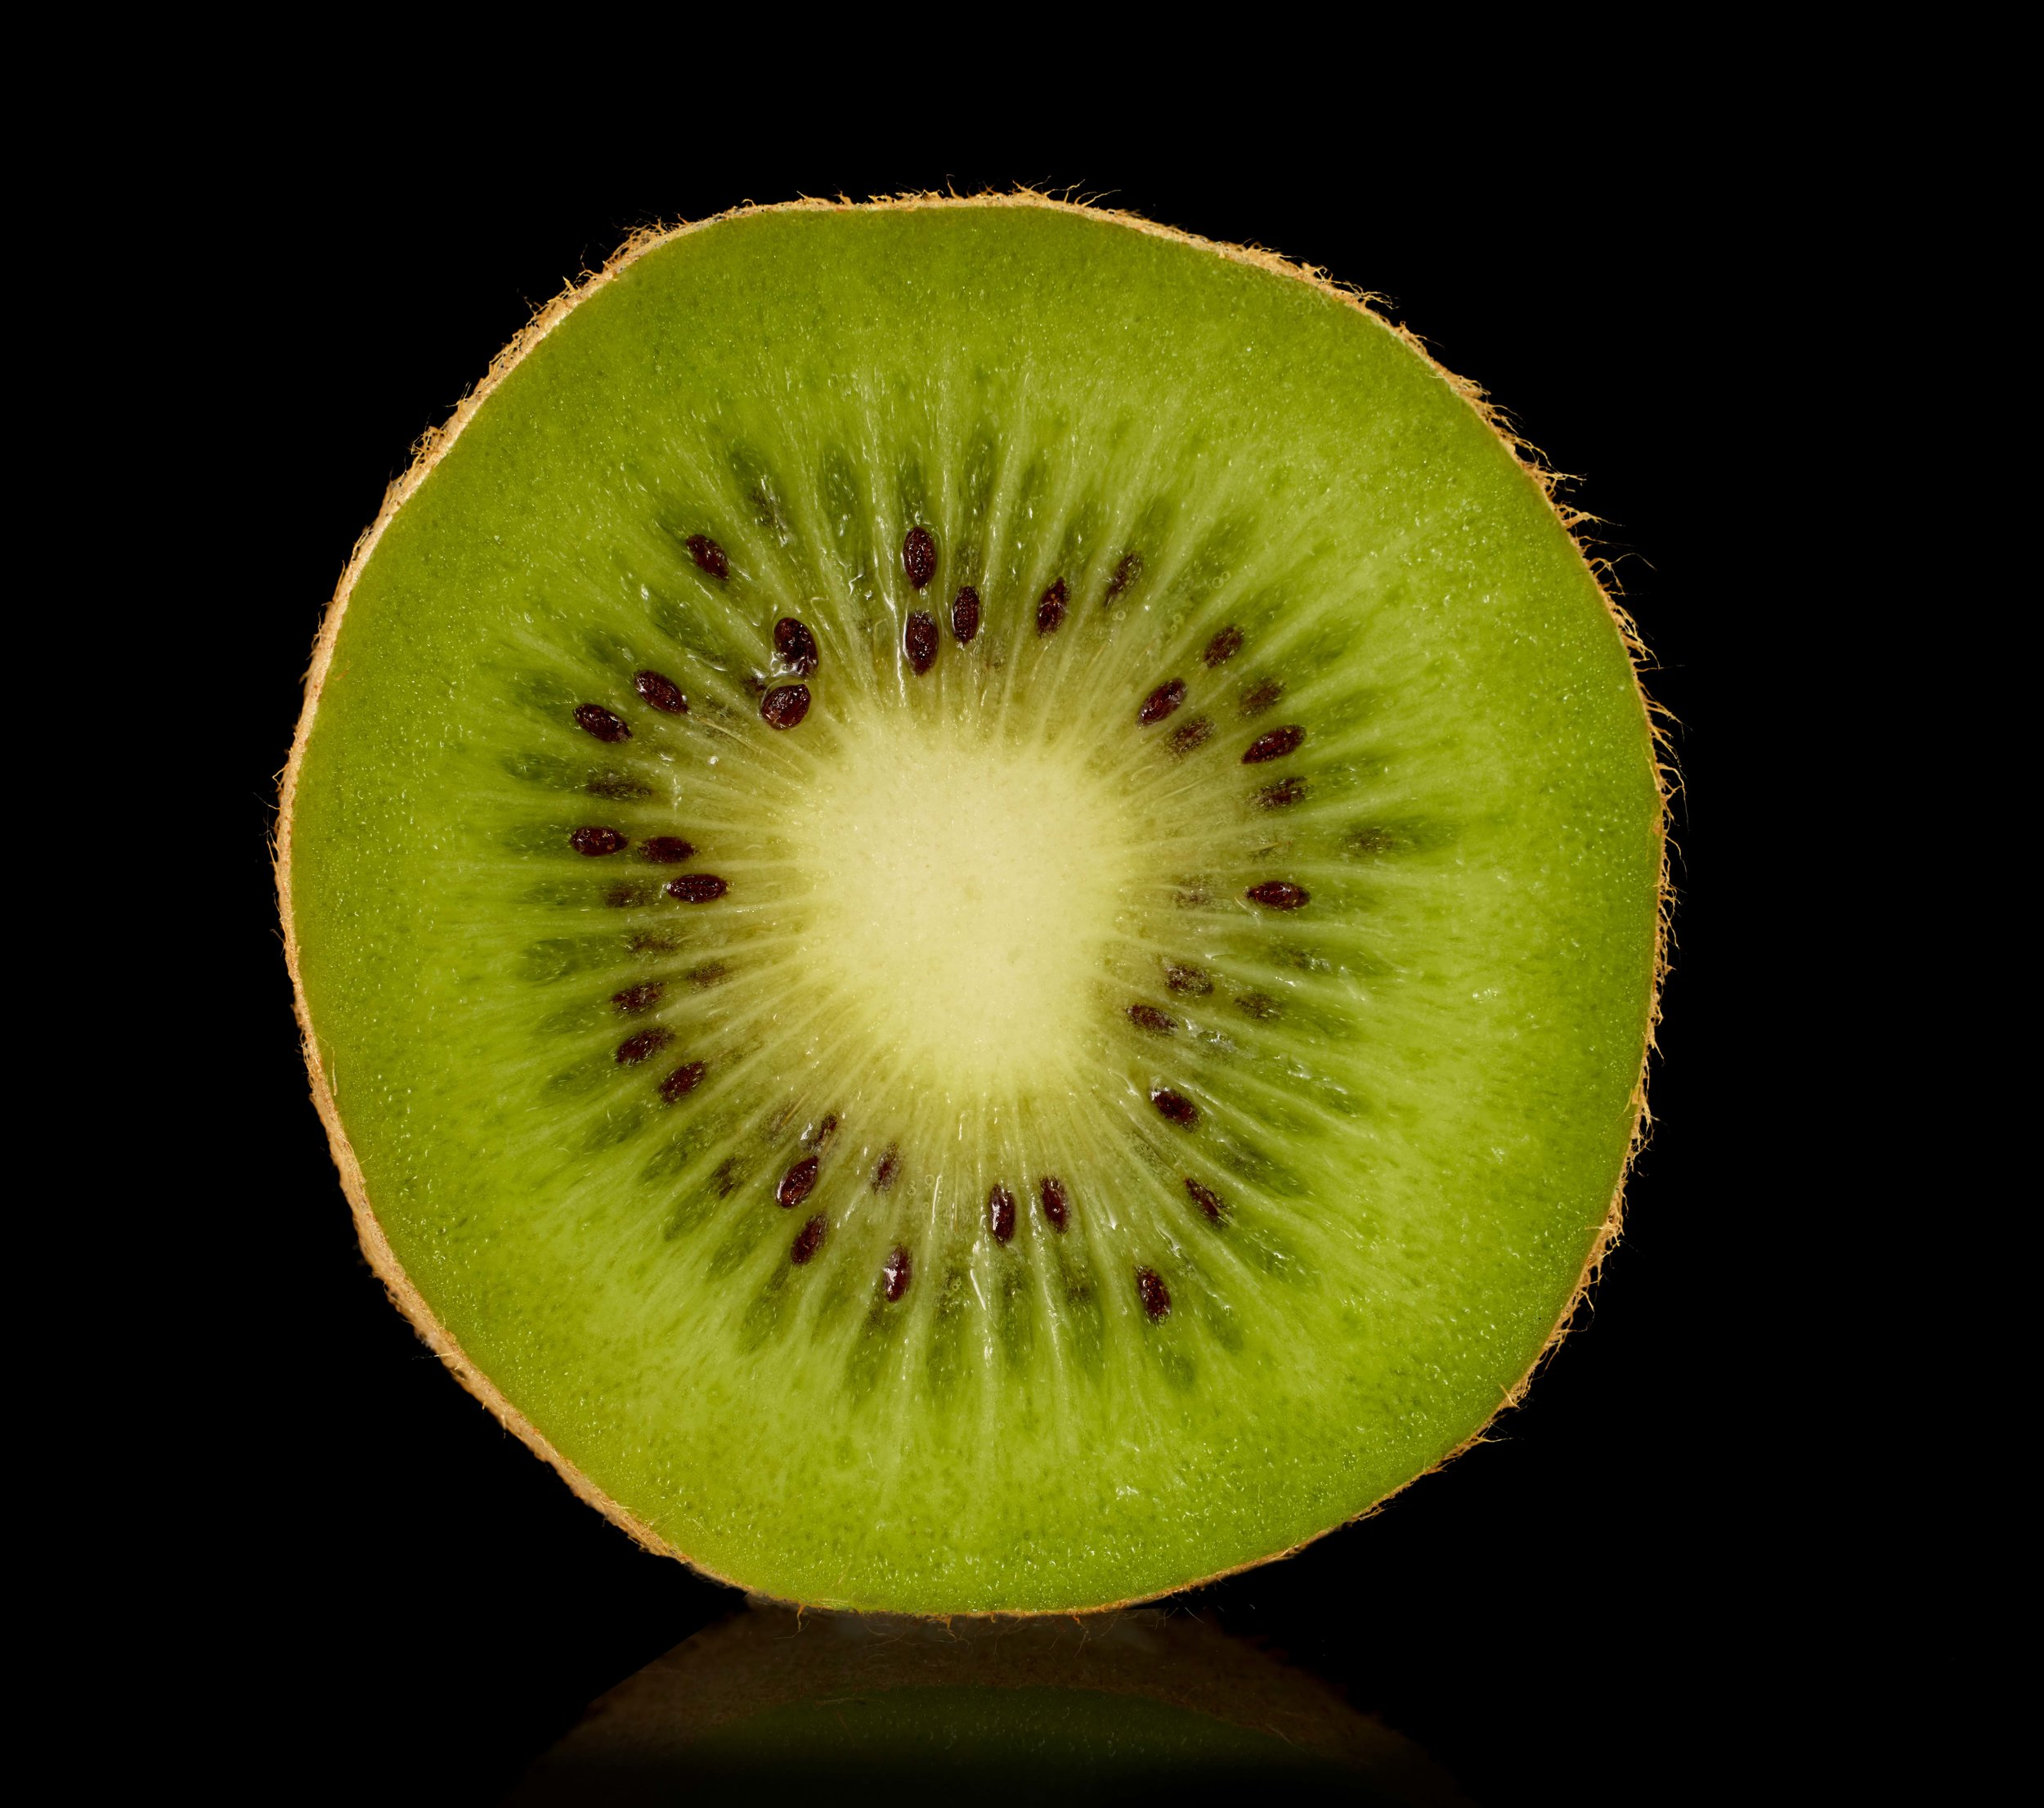 Green_Lightblue_Kiwi_Shot_58_Pathed1679.jpg